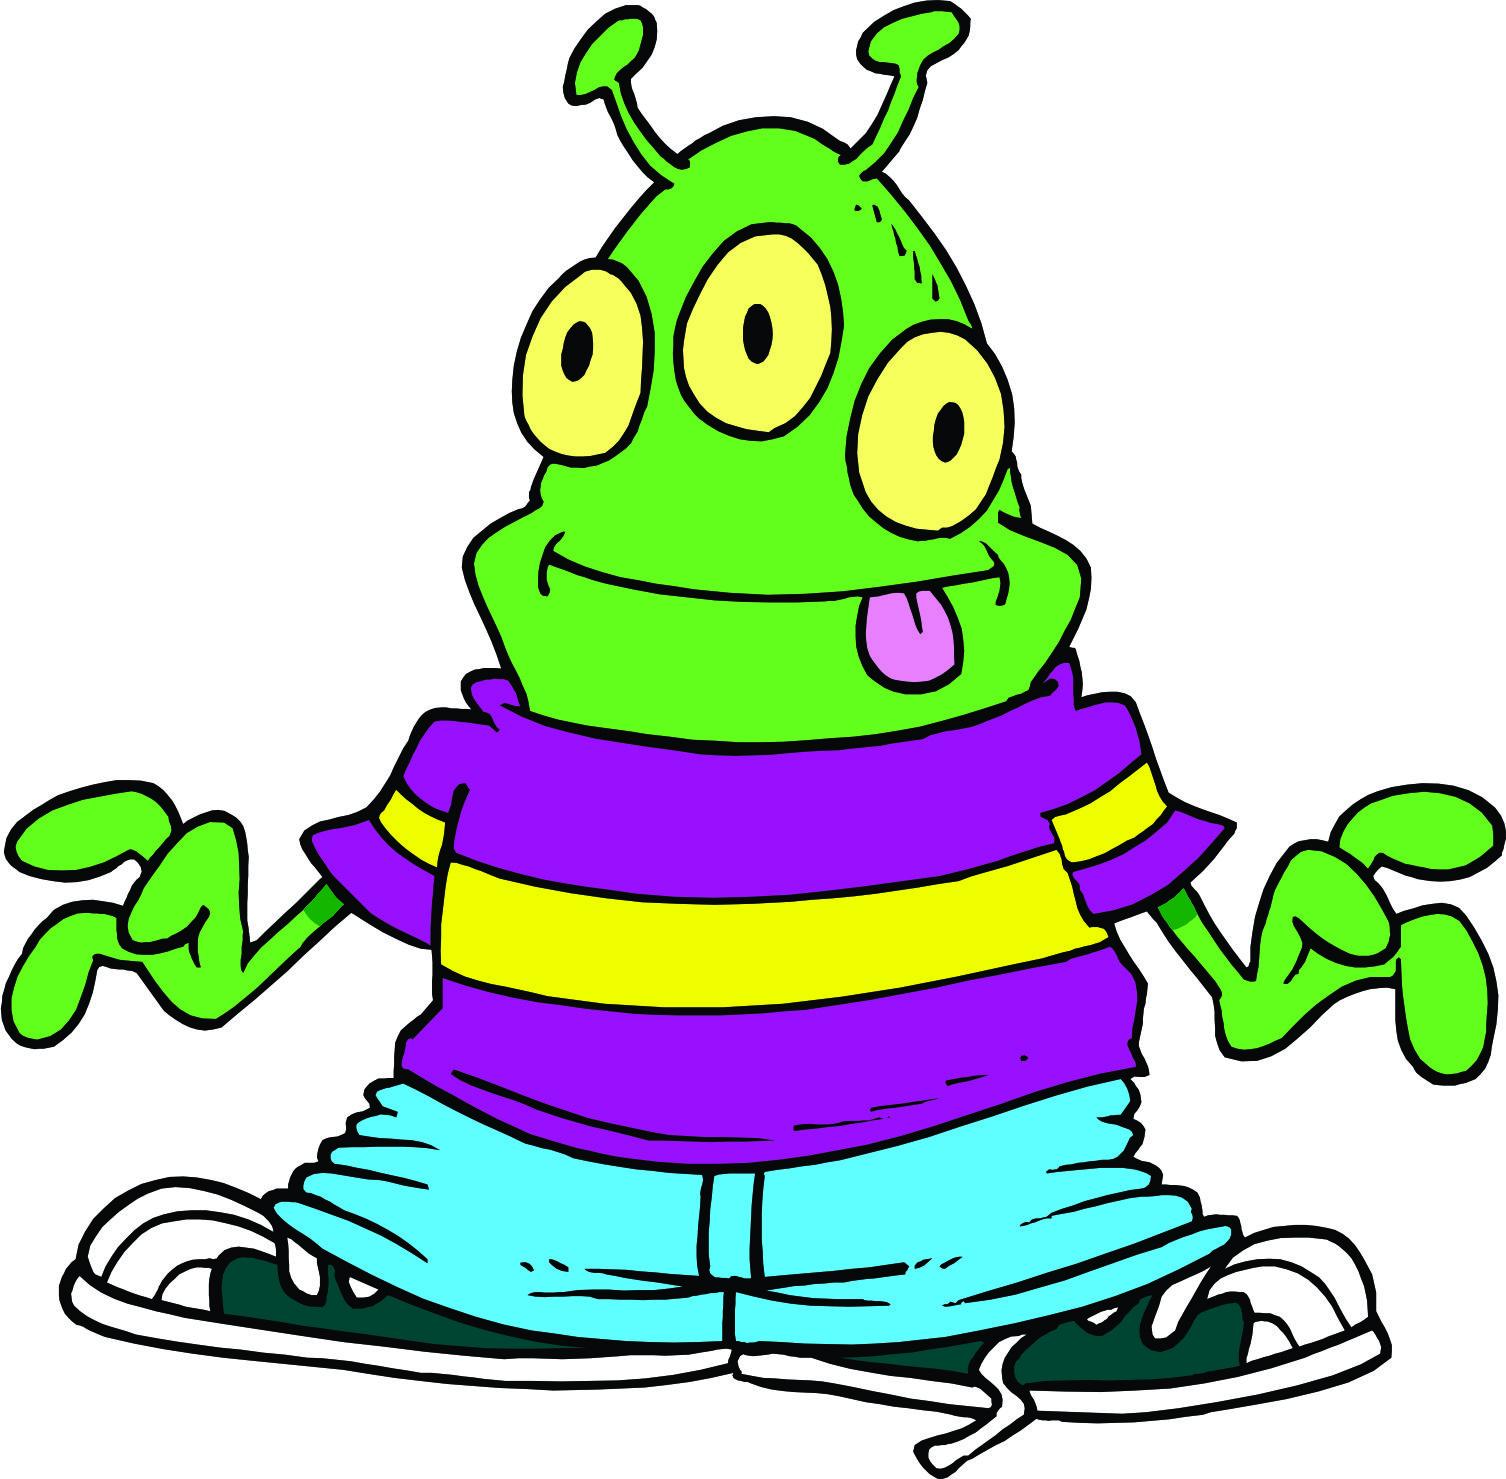 Three Eyed Alien Mascot.